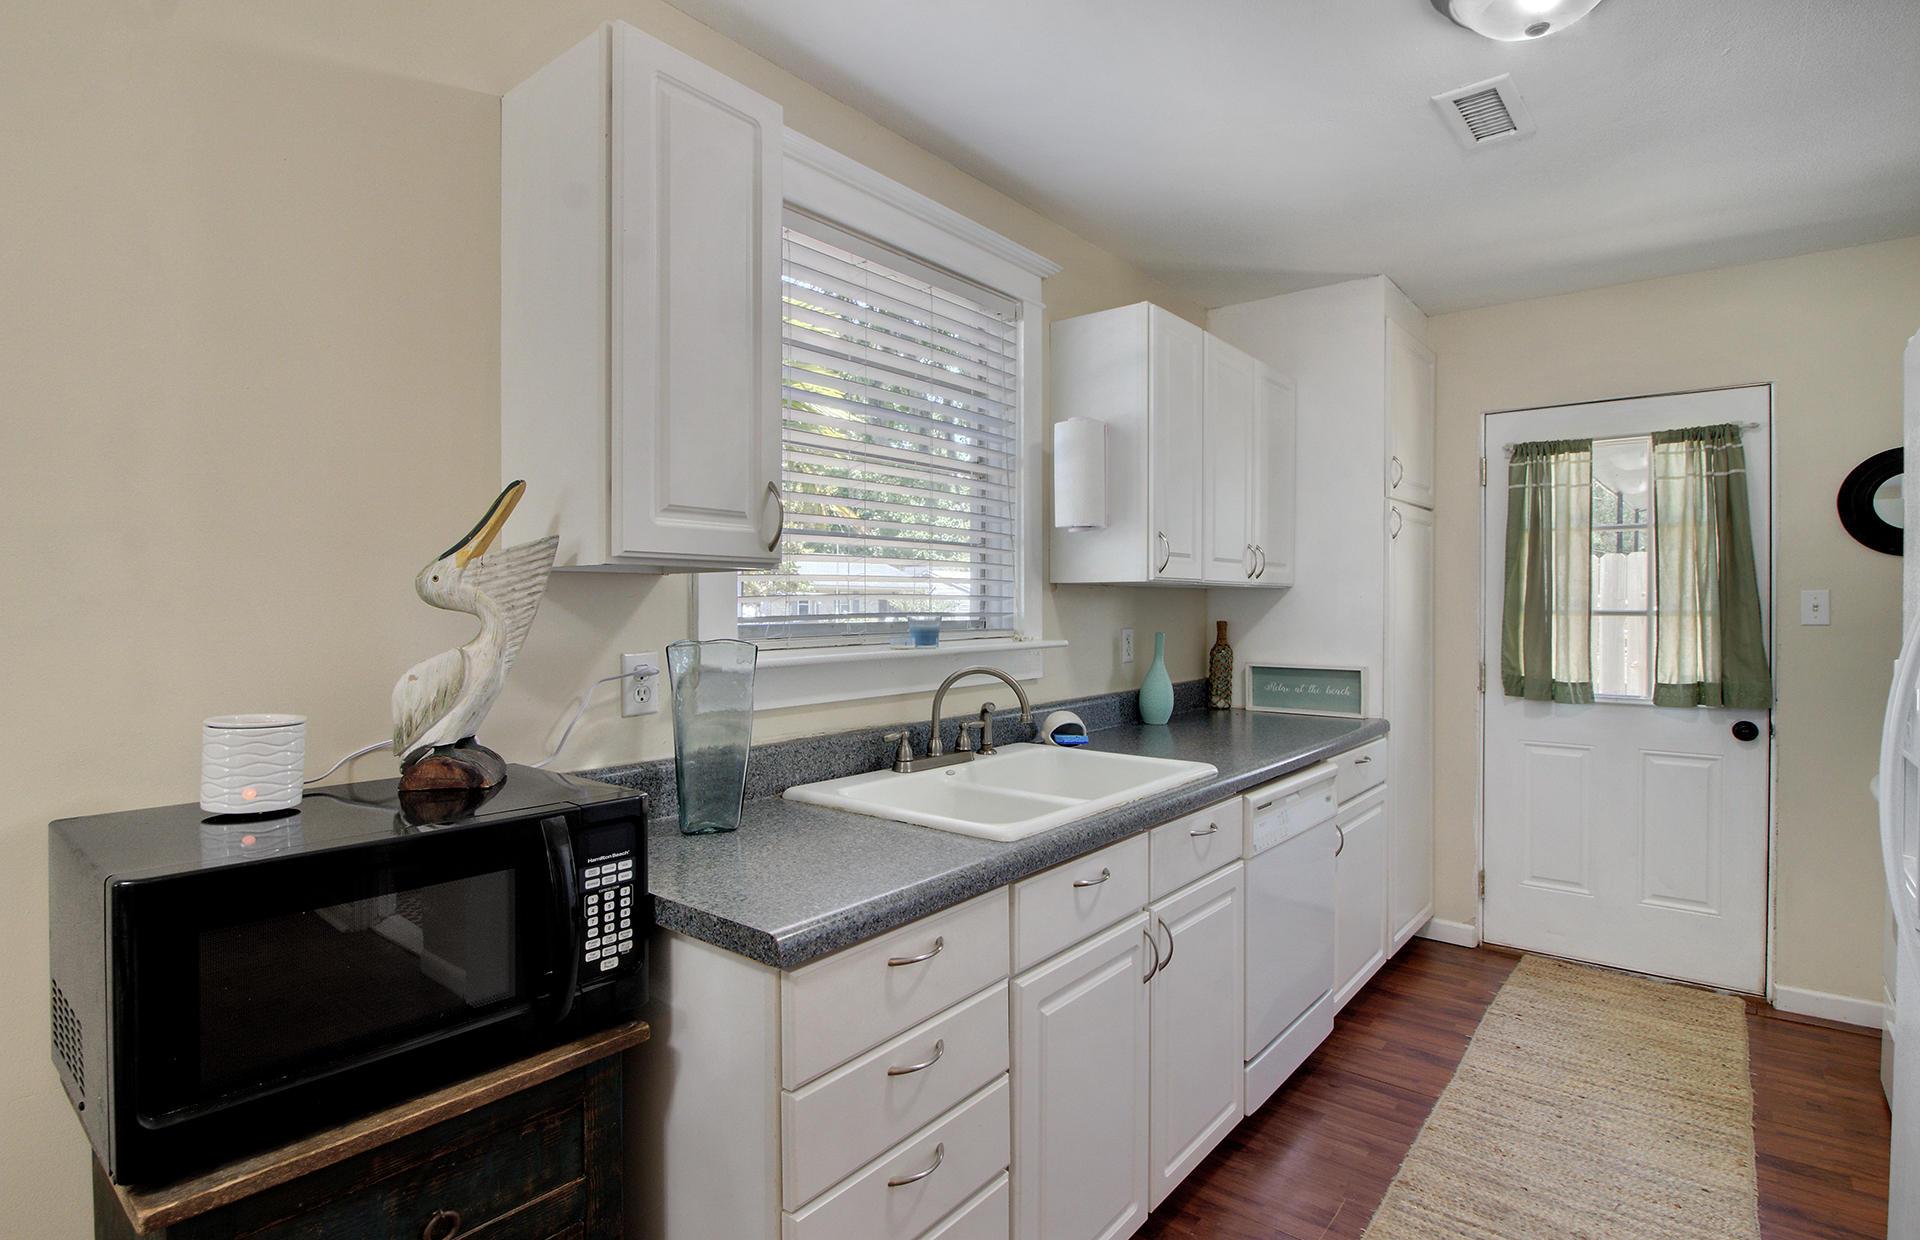 Orange Grove Estates Homes For Sale - 1531 Avalon, Charleston, SC - 19